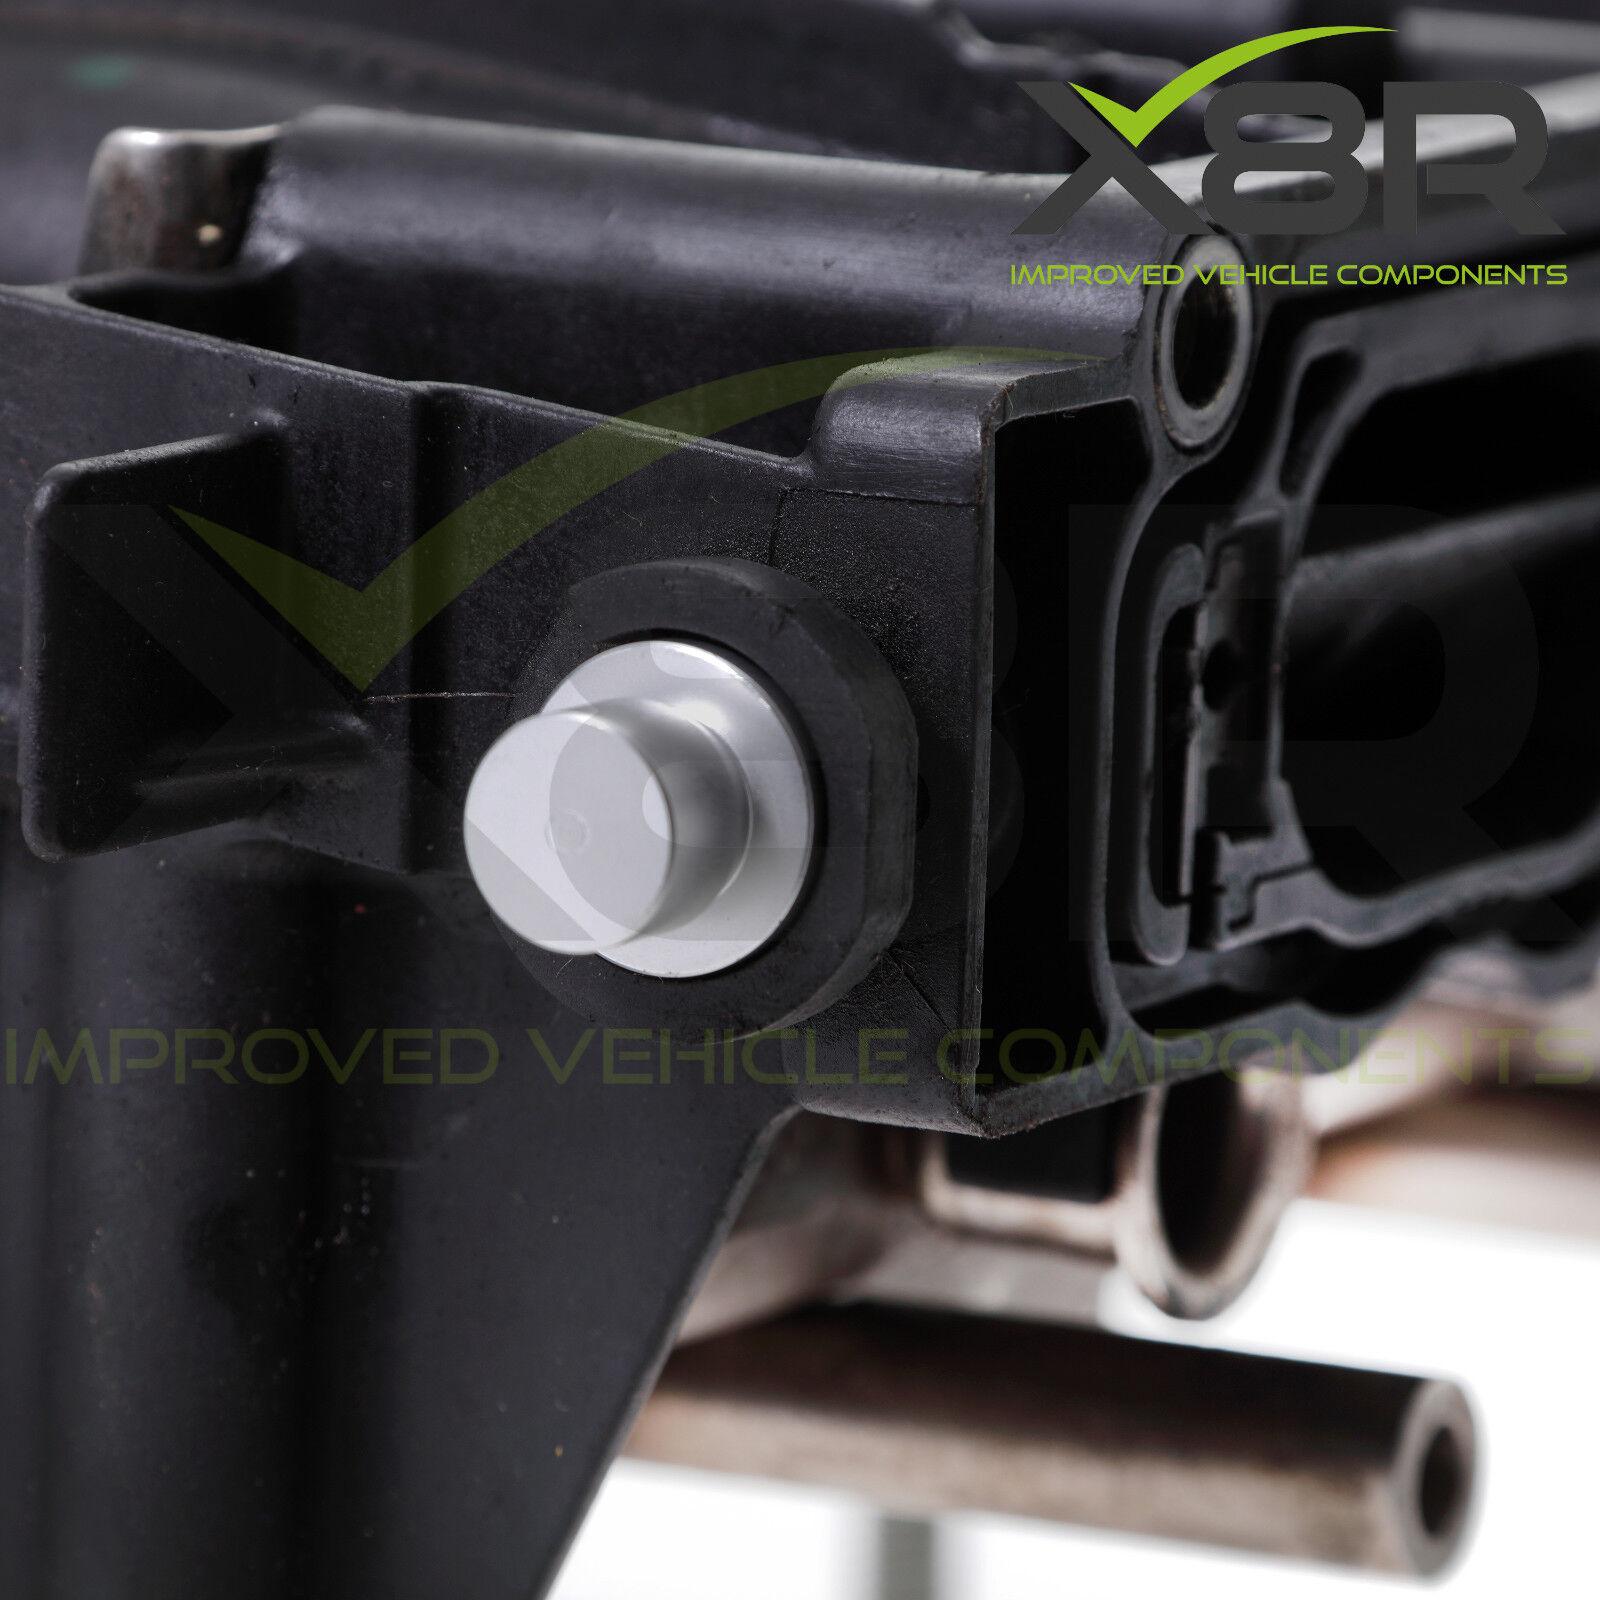 Inlet Intake Manifold Runner Flap Delete Removal Blanks Kit For Audi VW 2.0 TFSI